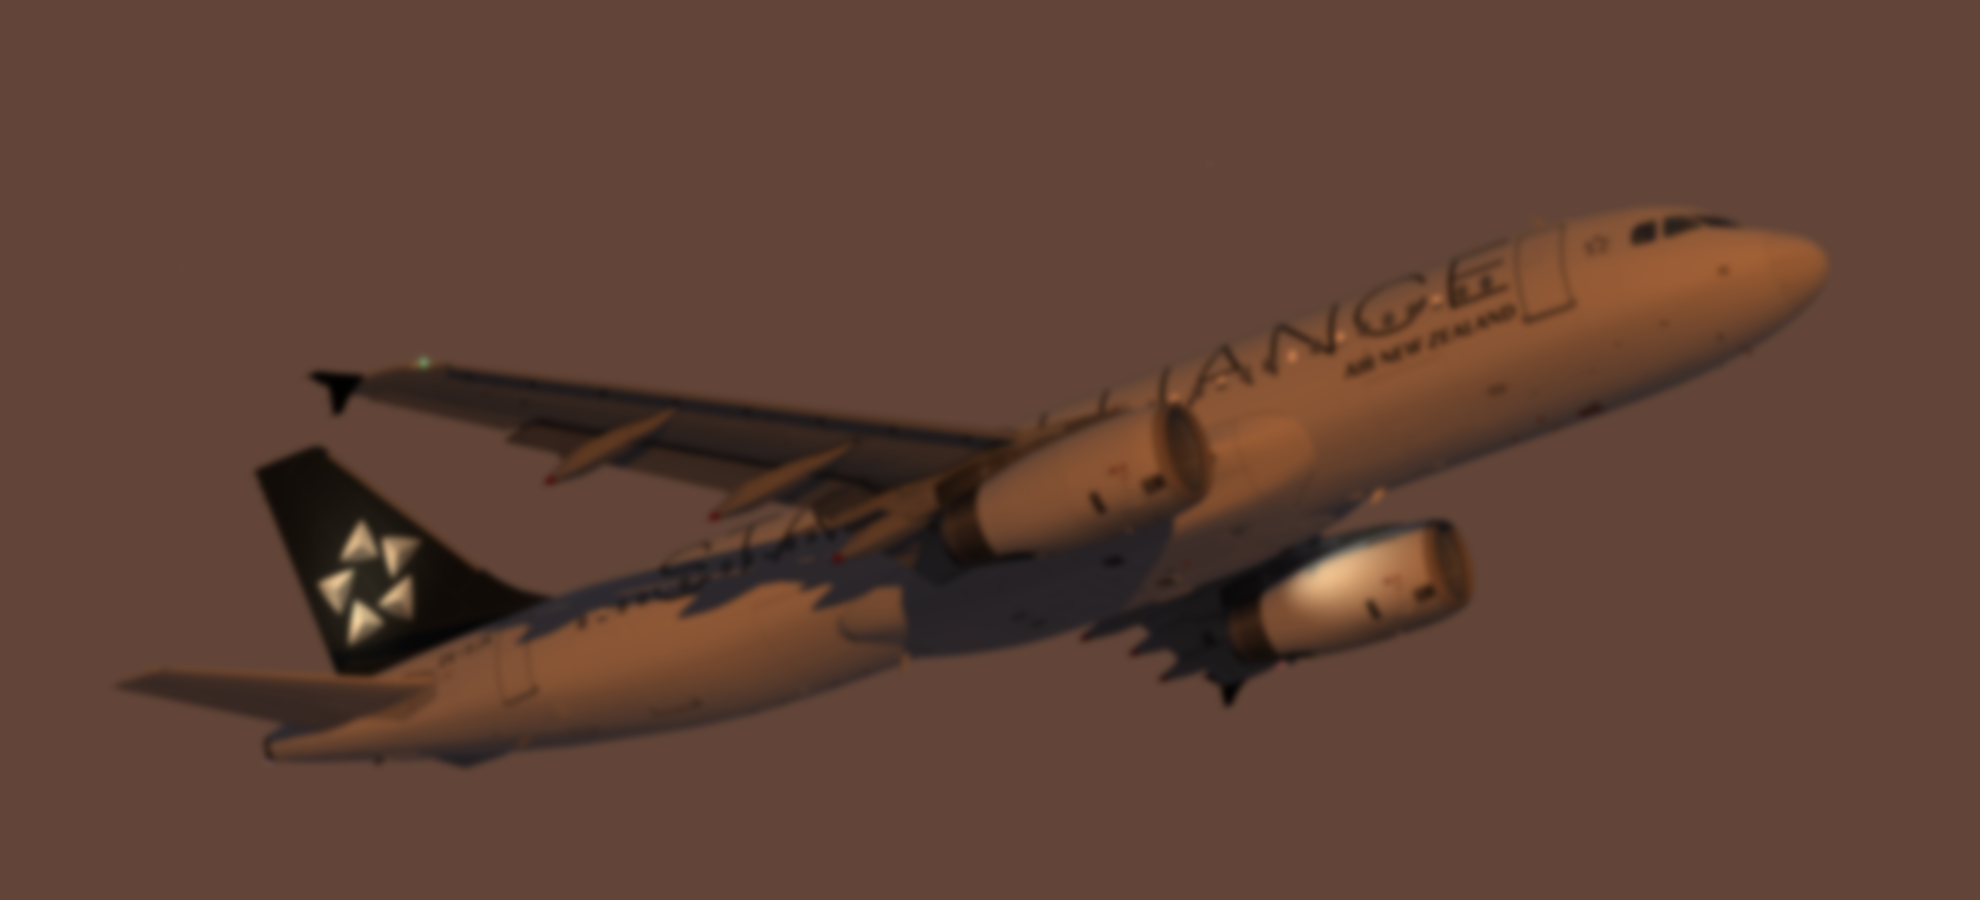 FSLabs A320 -